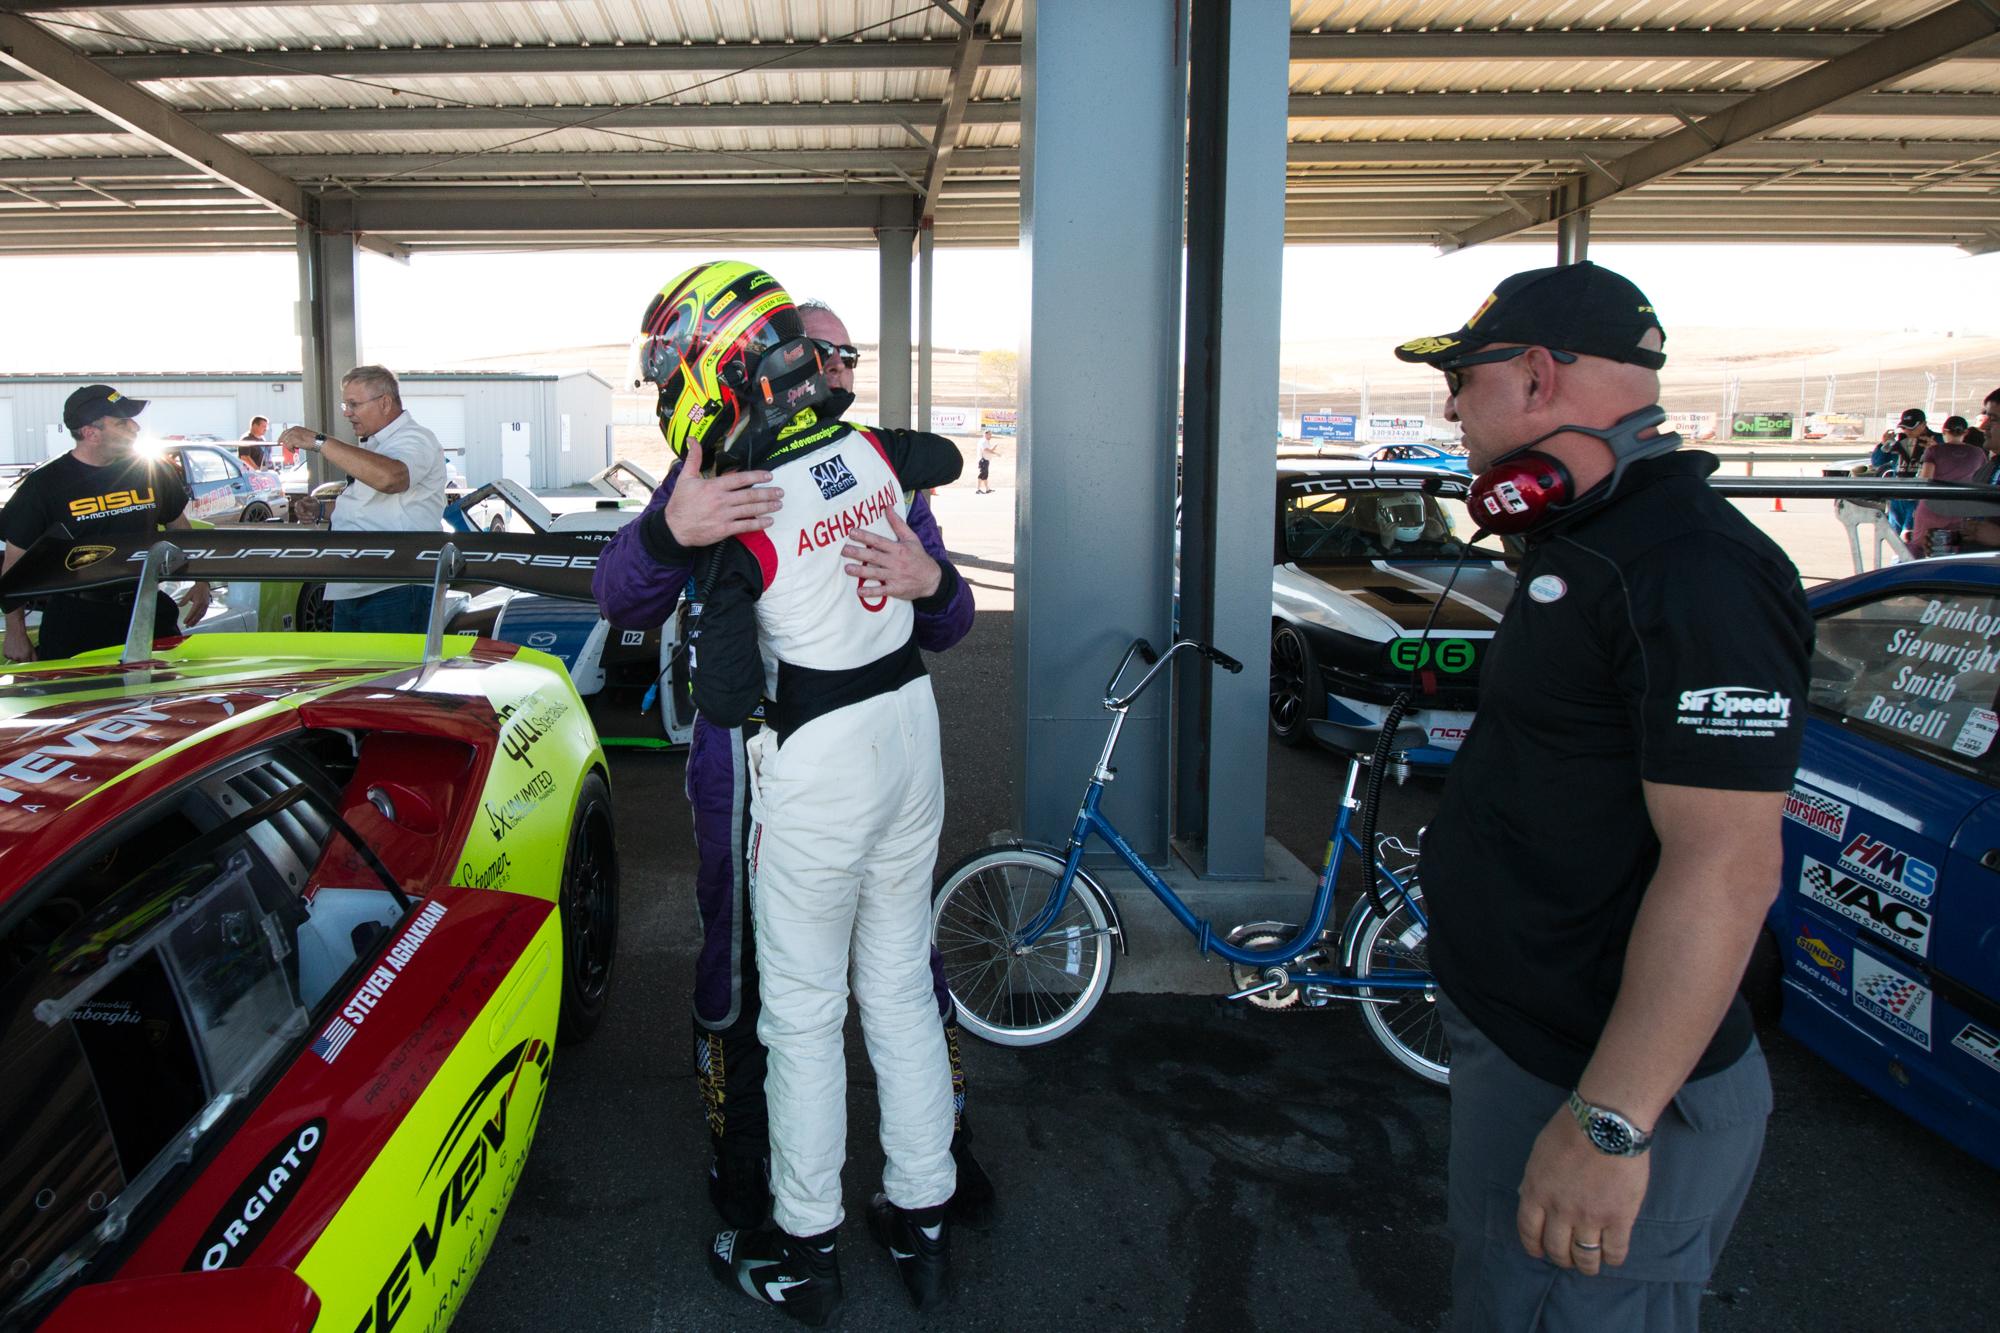 Steven-Racing-20130208-45833.jpg